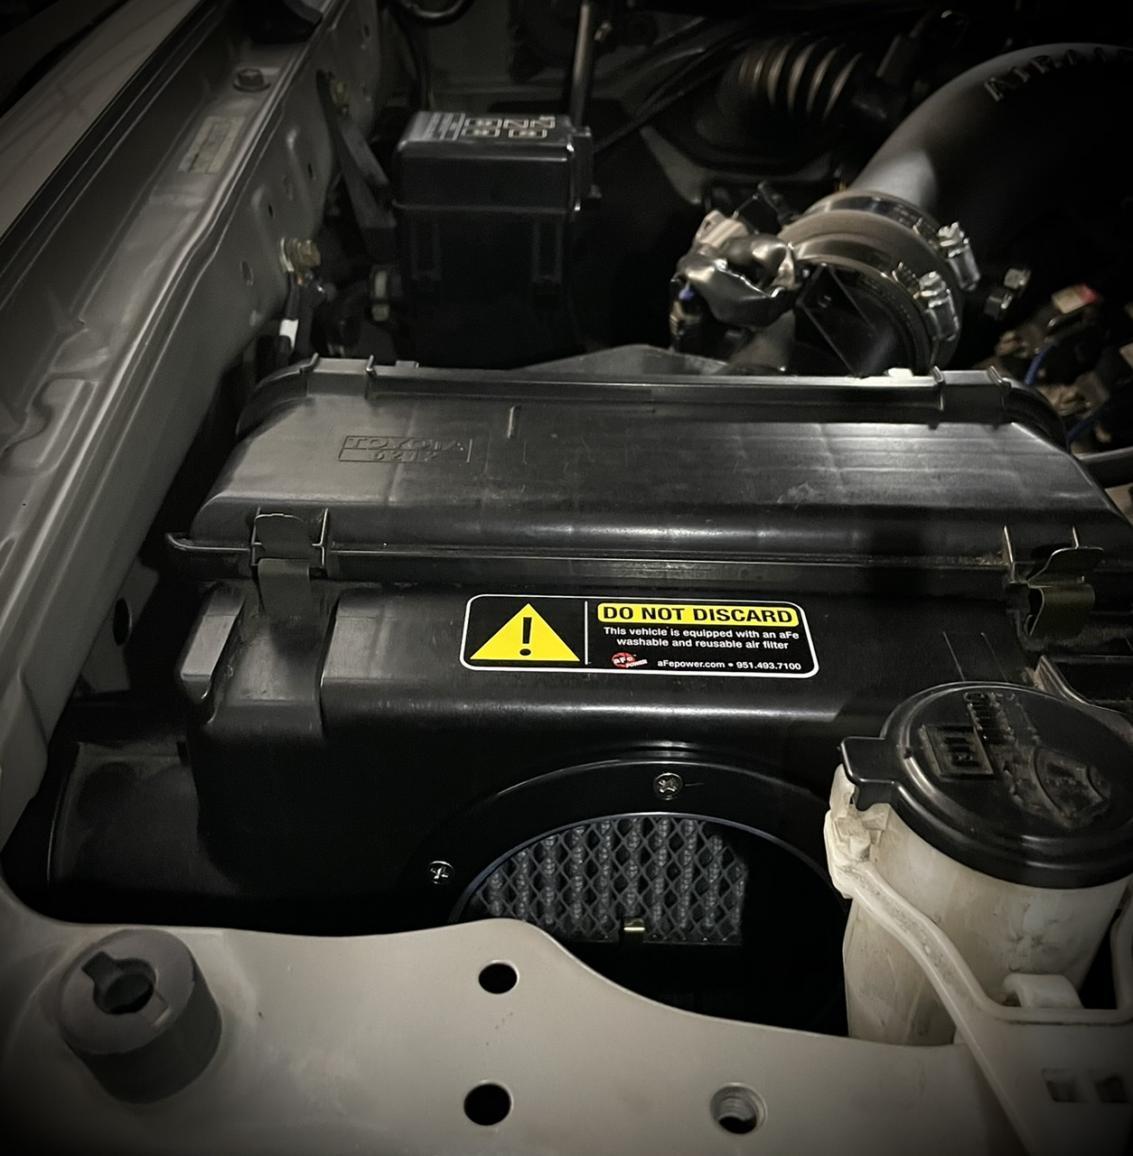 Formidable 2002 Thundercloud Sport TRD Supercharged Version 2.0-c6da2f2e-0a08-4da9-a608-e2fc8a142358-jpg